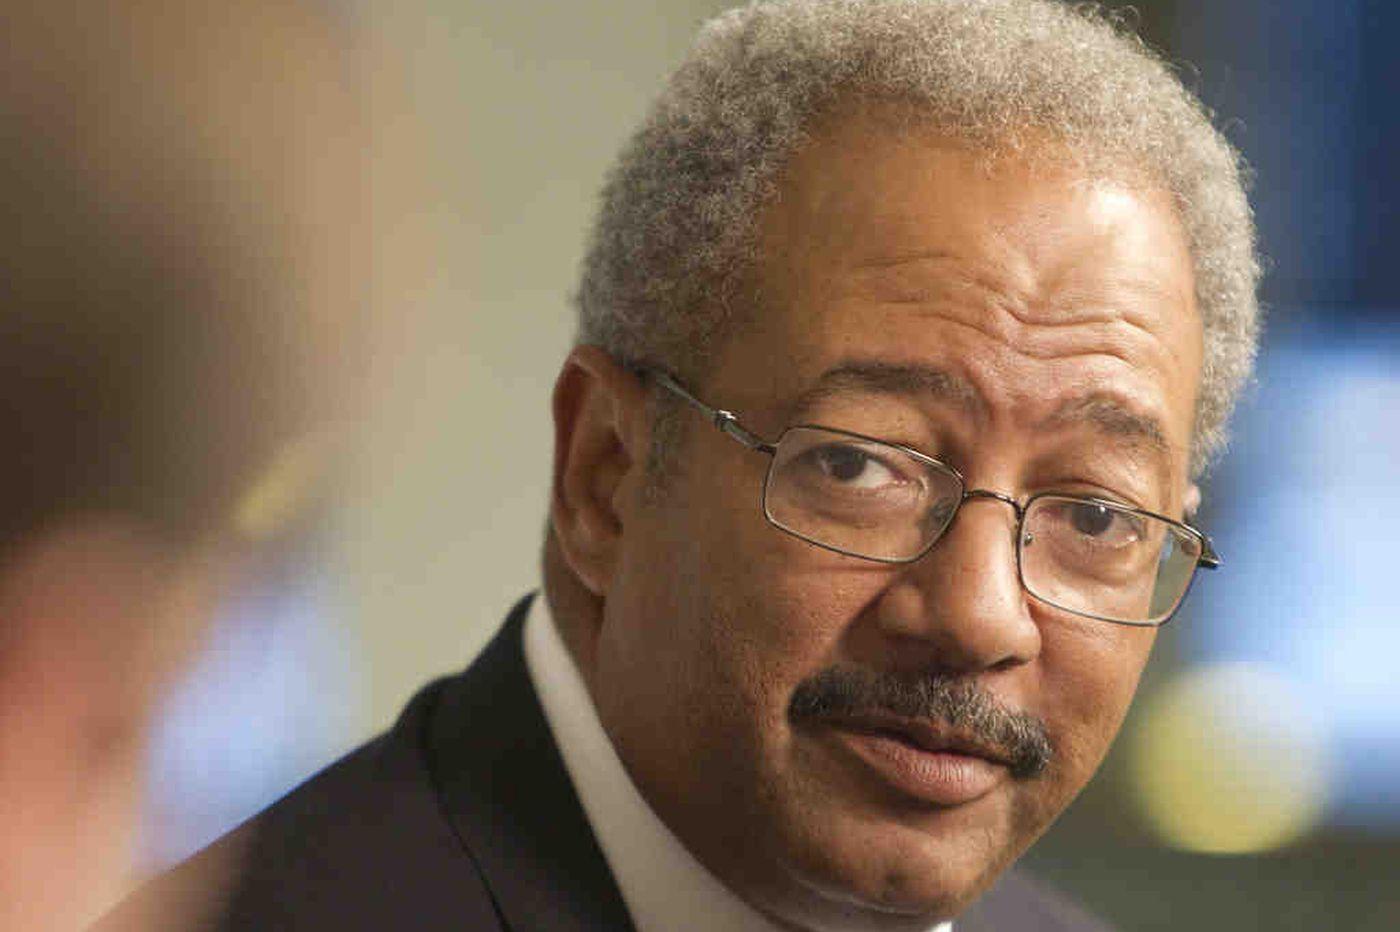 Former aide's guilty plea raises questions for U.S. Rep. Chaka Fattah